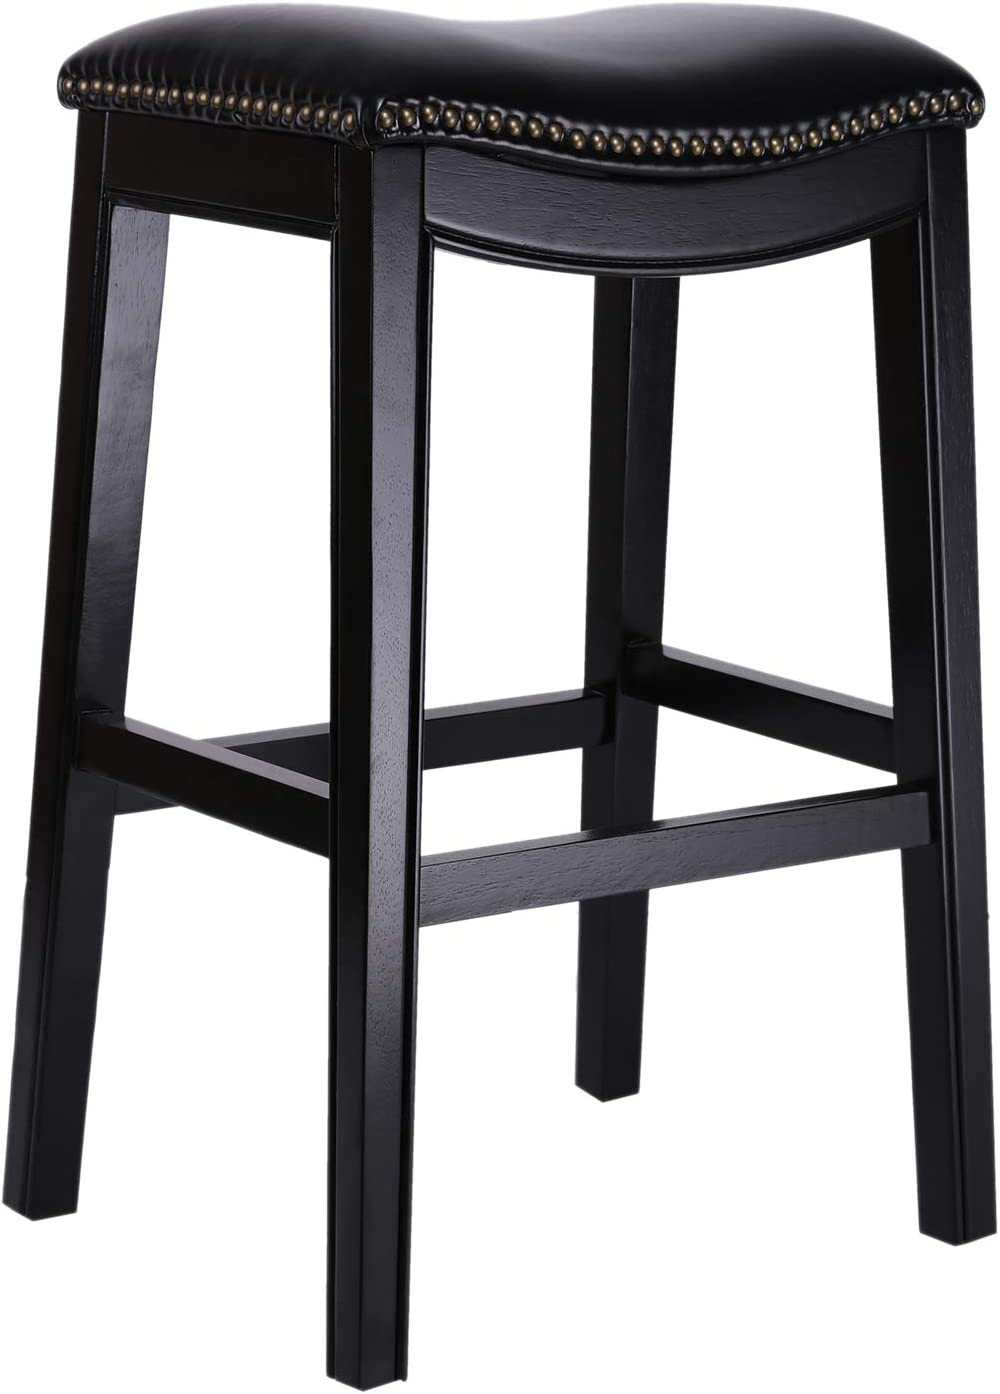 Bravery Padded Saddle Stool 30- Inch Height, Bar Stool with Backless , Wood Counter Stools Nailhead and Cushion Seat , Wlanut /Black Amoyland (Black)